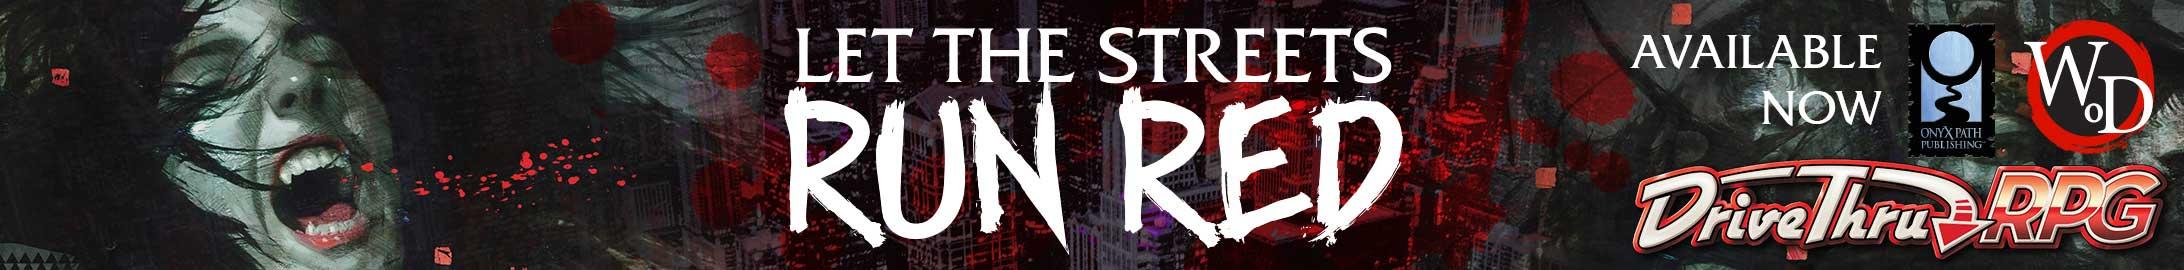 Let the Streets Run Red @ DriveThruRPG.com